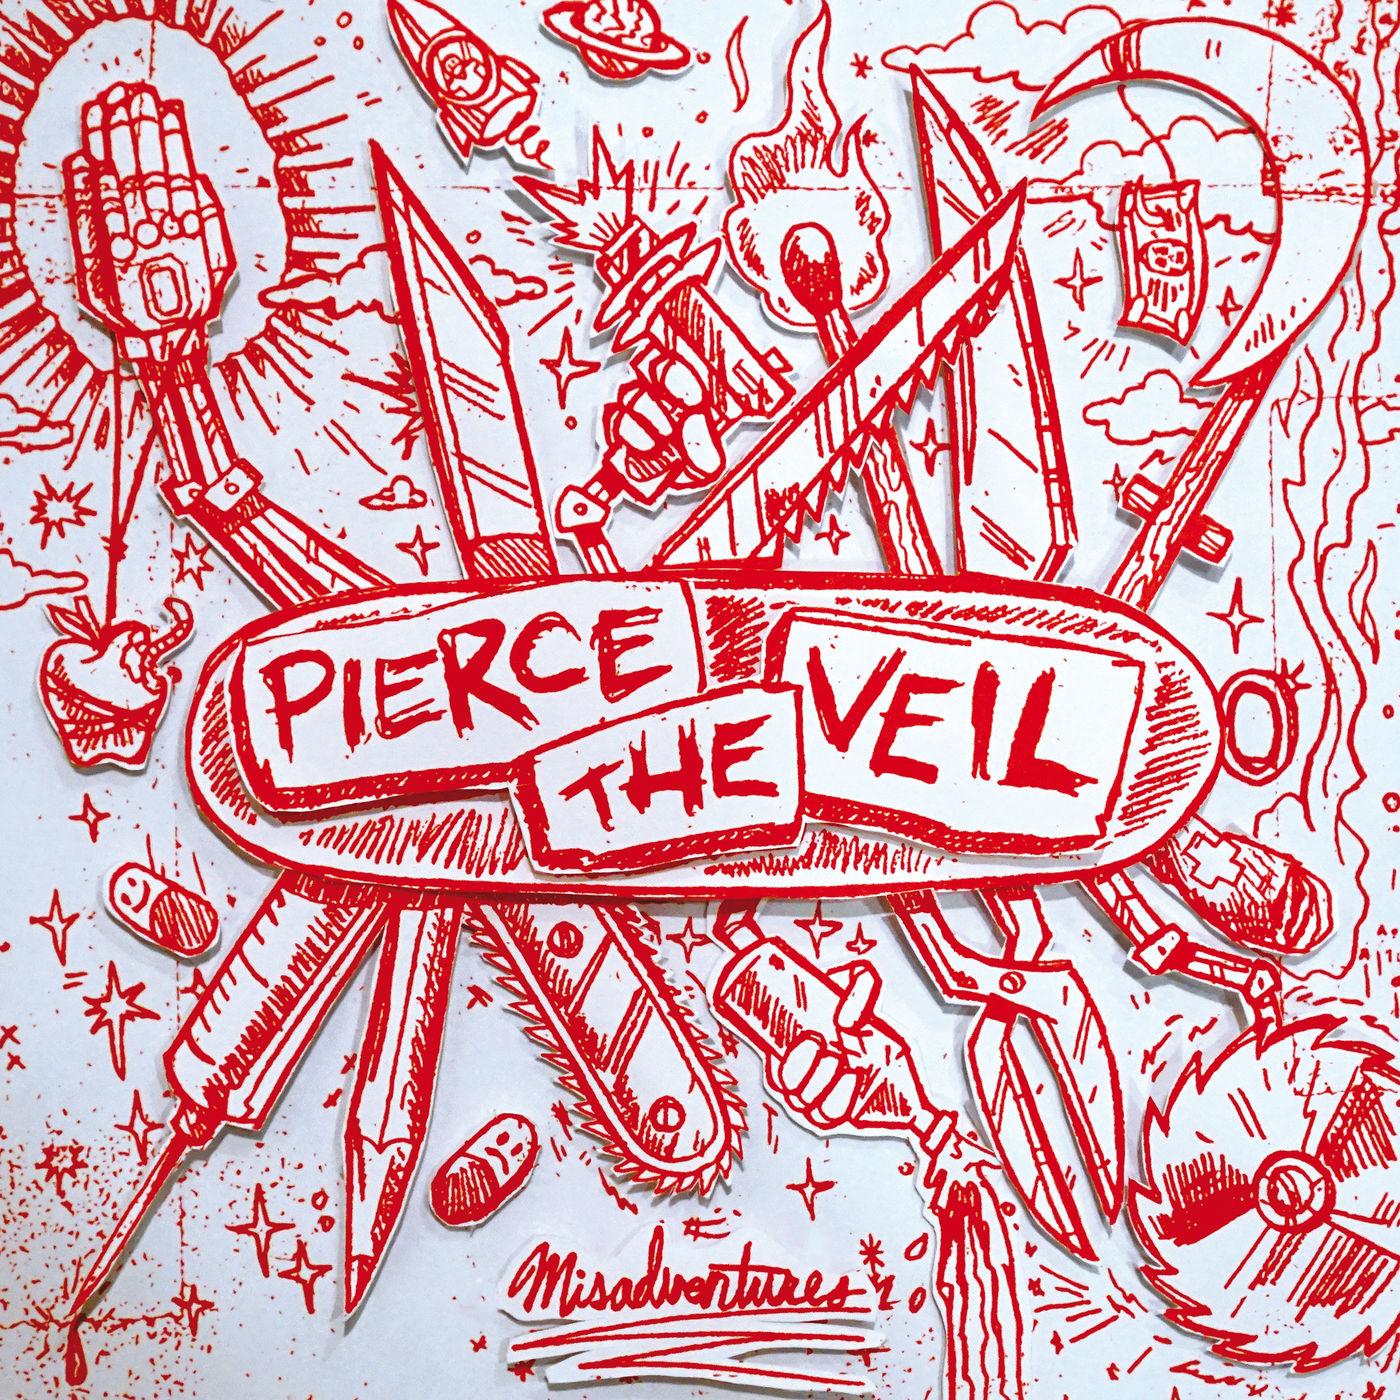 Pierce the Veil - Misadventures (2016)